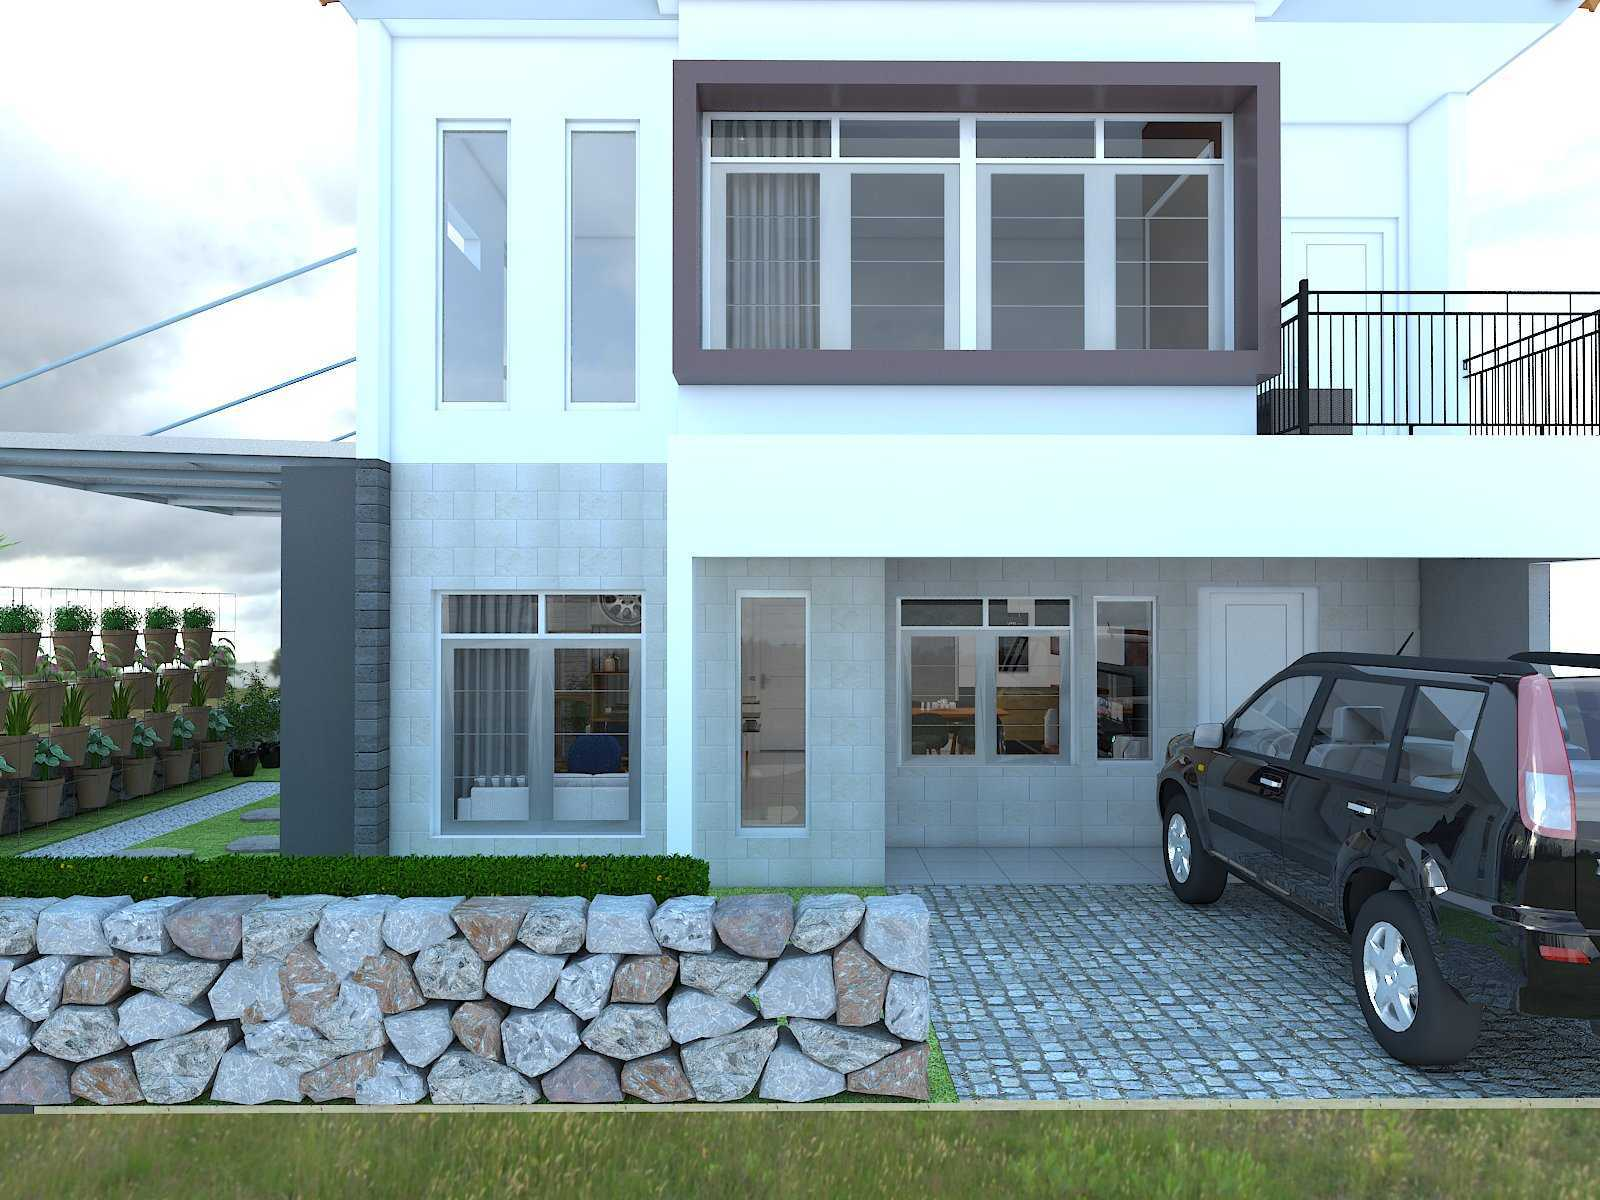 Donnie Marcellino Mr.f's House  Gg. Buntu 2, Jatimelati, Pondokmelati, Kota Bks, Jawa Barat 17415, Indonesia Front Of The House Kontemporer  30161